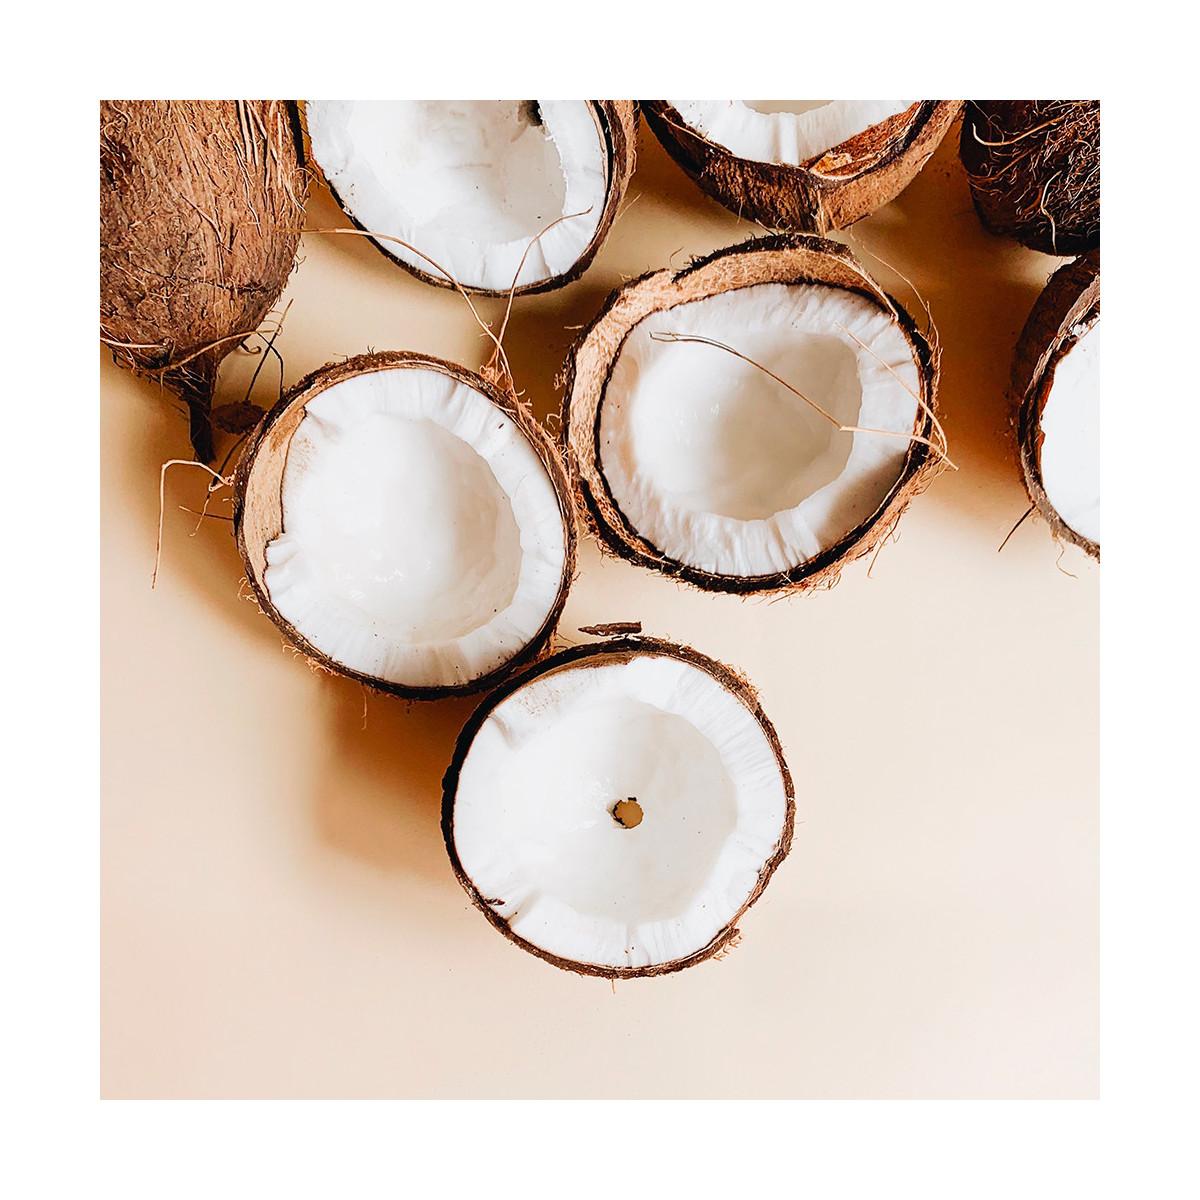 Fragrance Crème de Coco